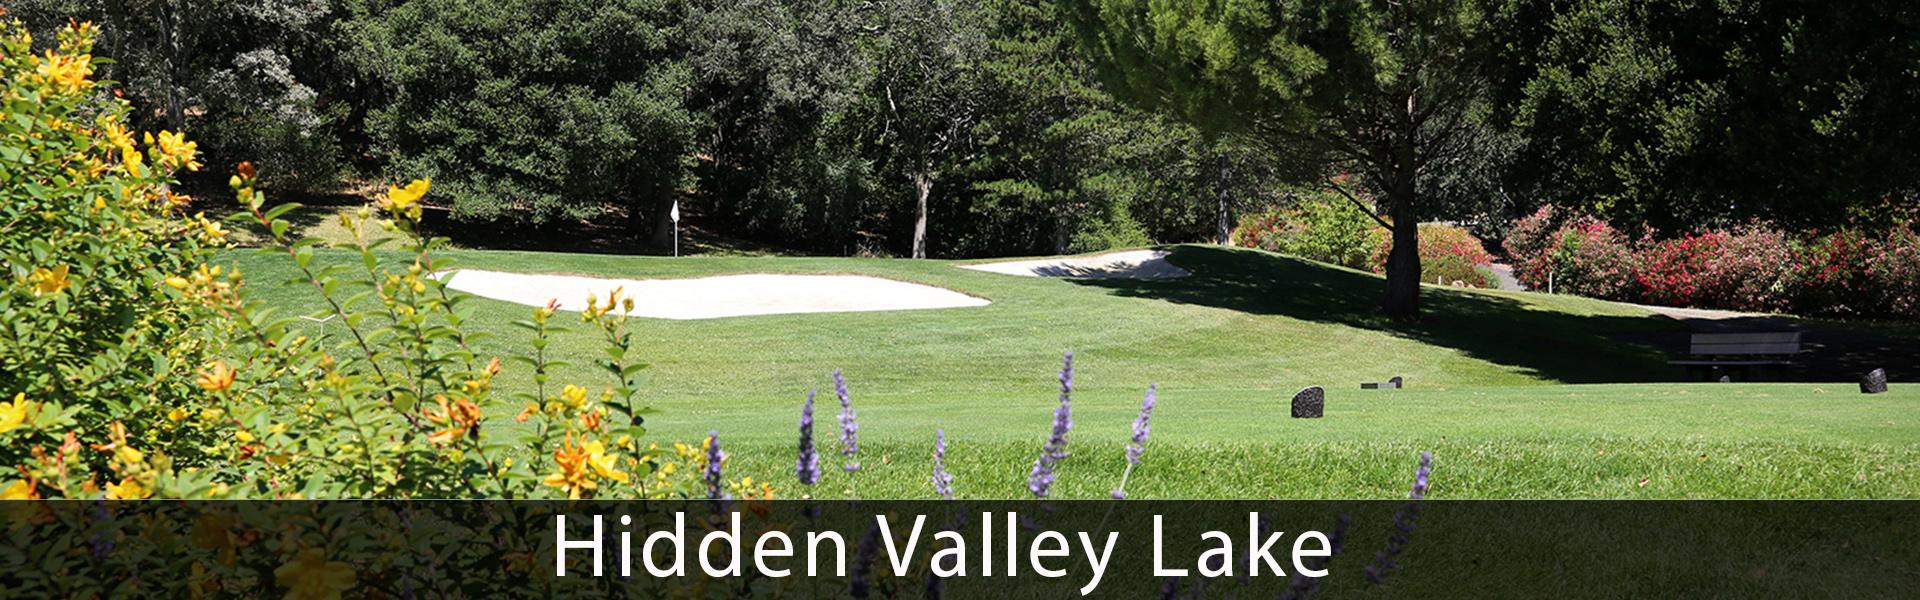 hidden-valley-lake-banner